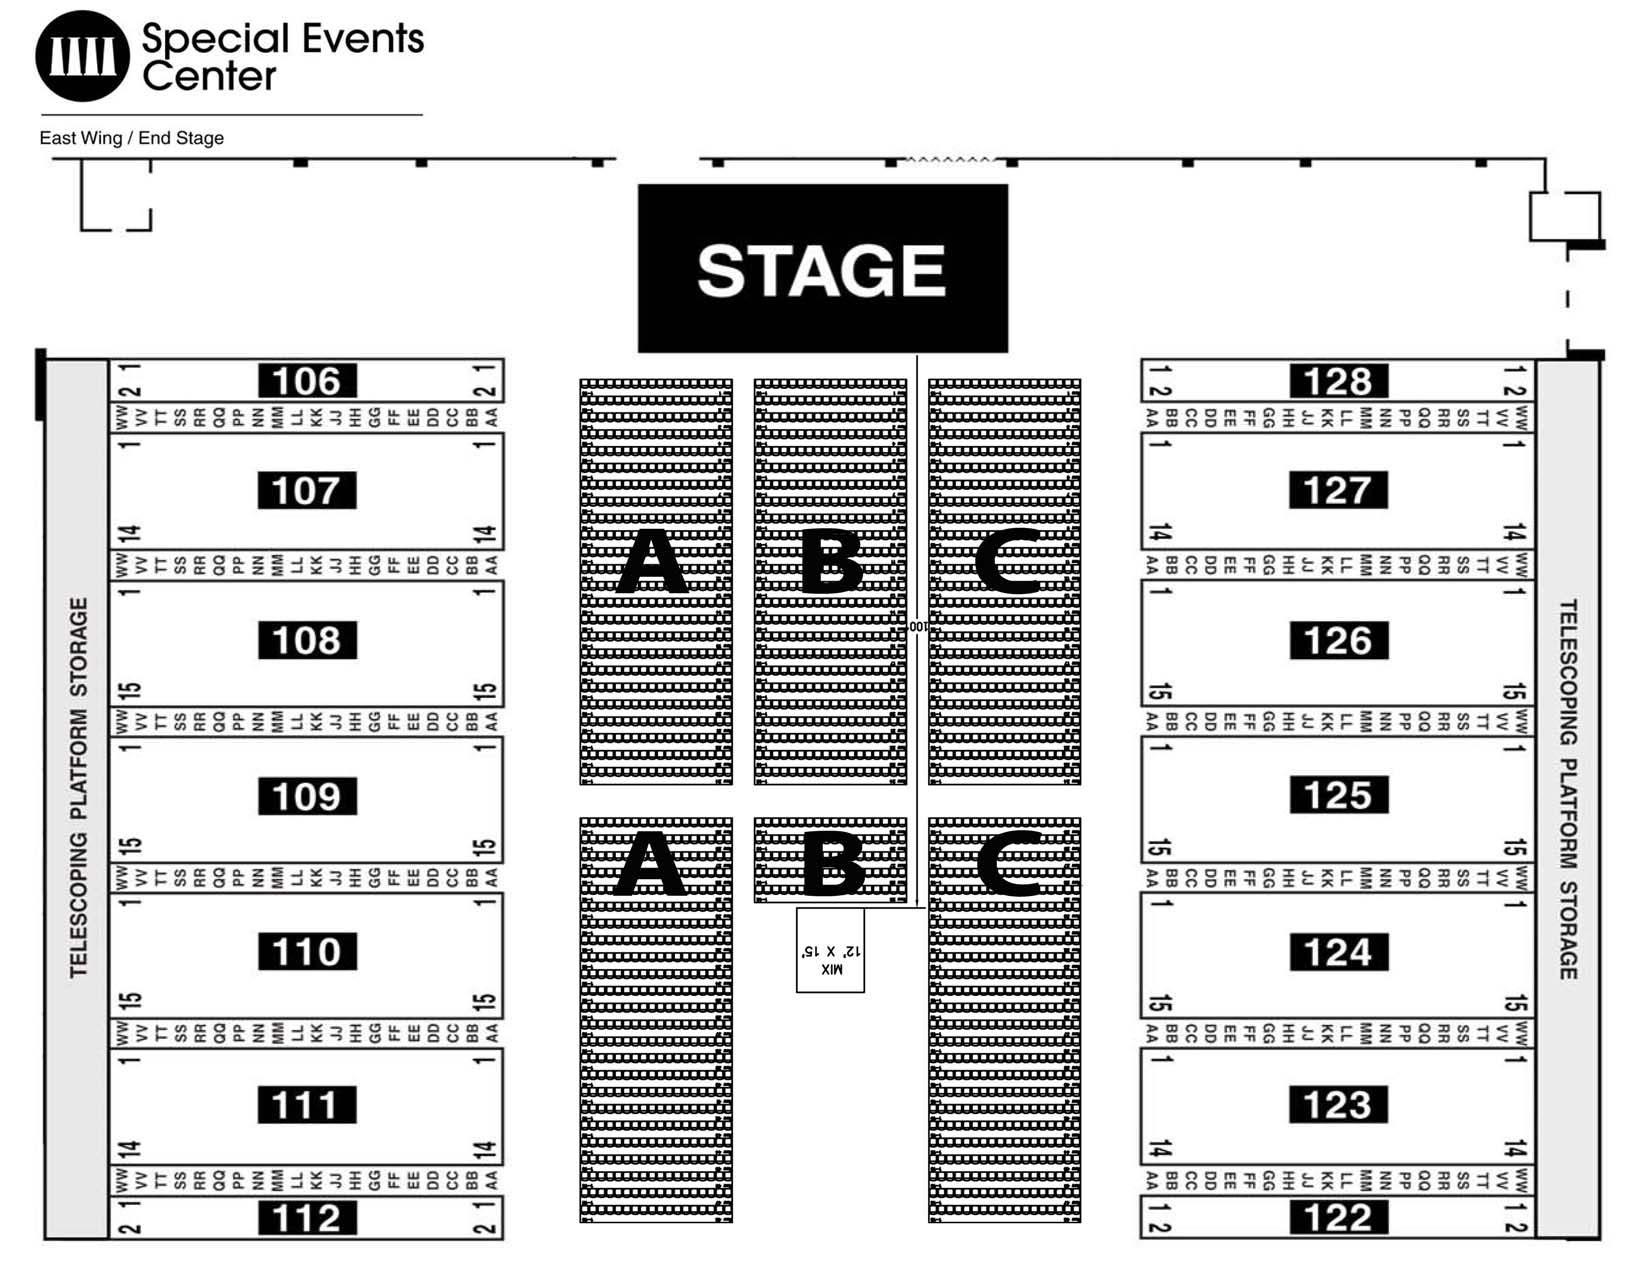 Greensboro Coliseum Seating Map Seating Chart   SEE SEATING CHARTS MODULE | Greensboro Coliseum